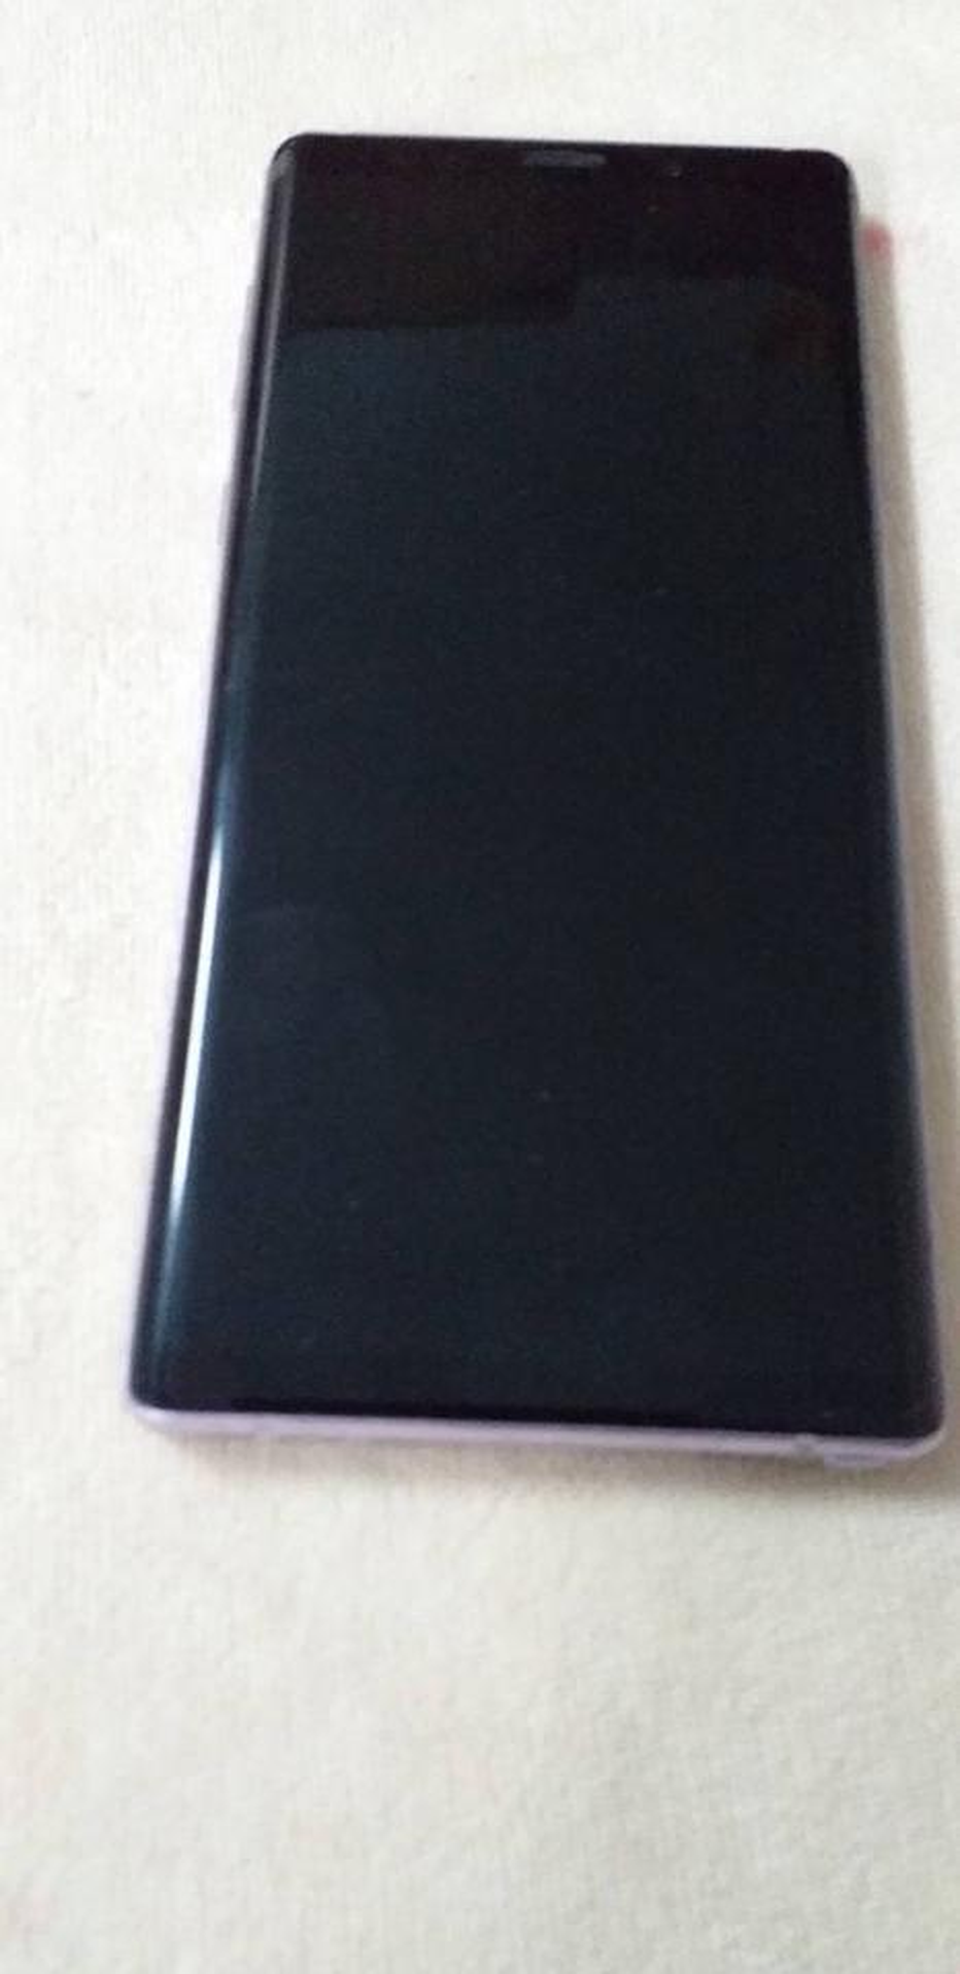 Samsung note9 รูปที่ 1